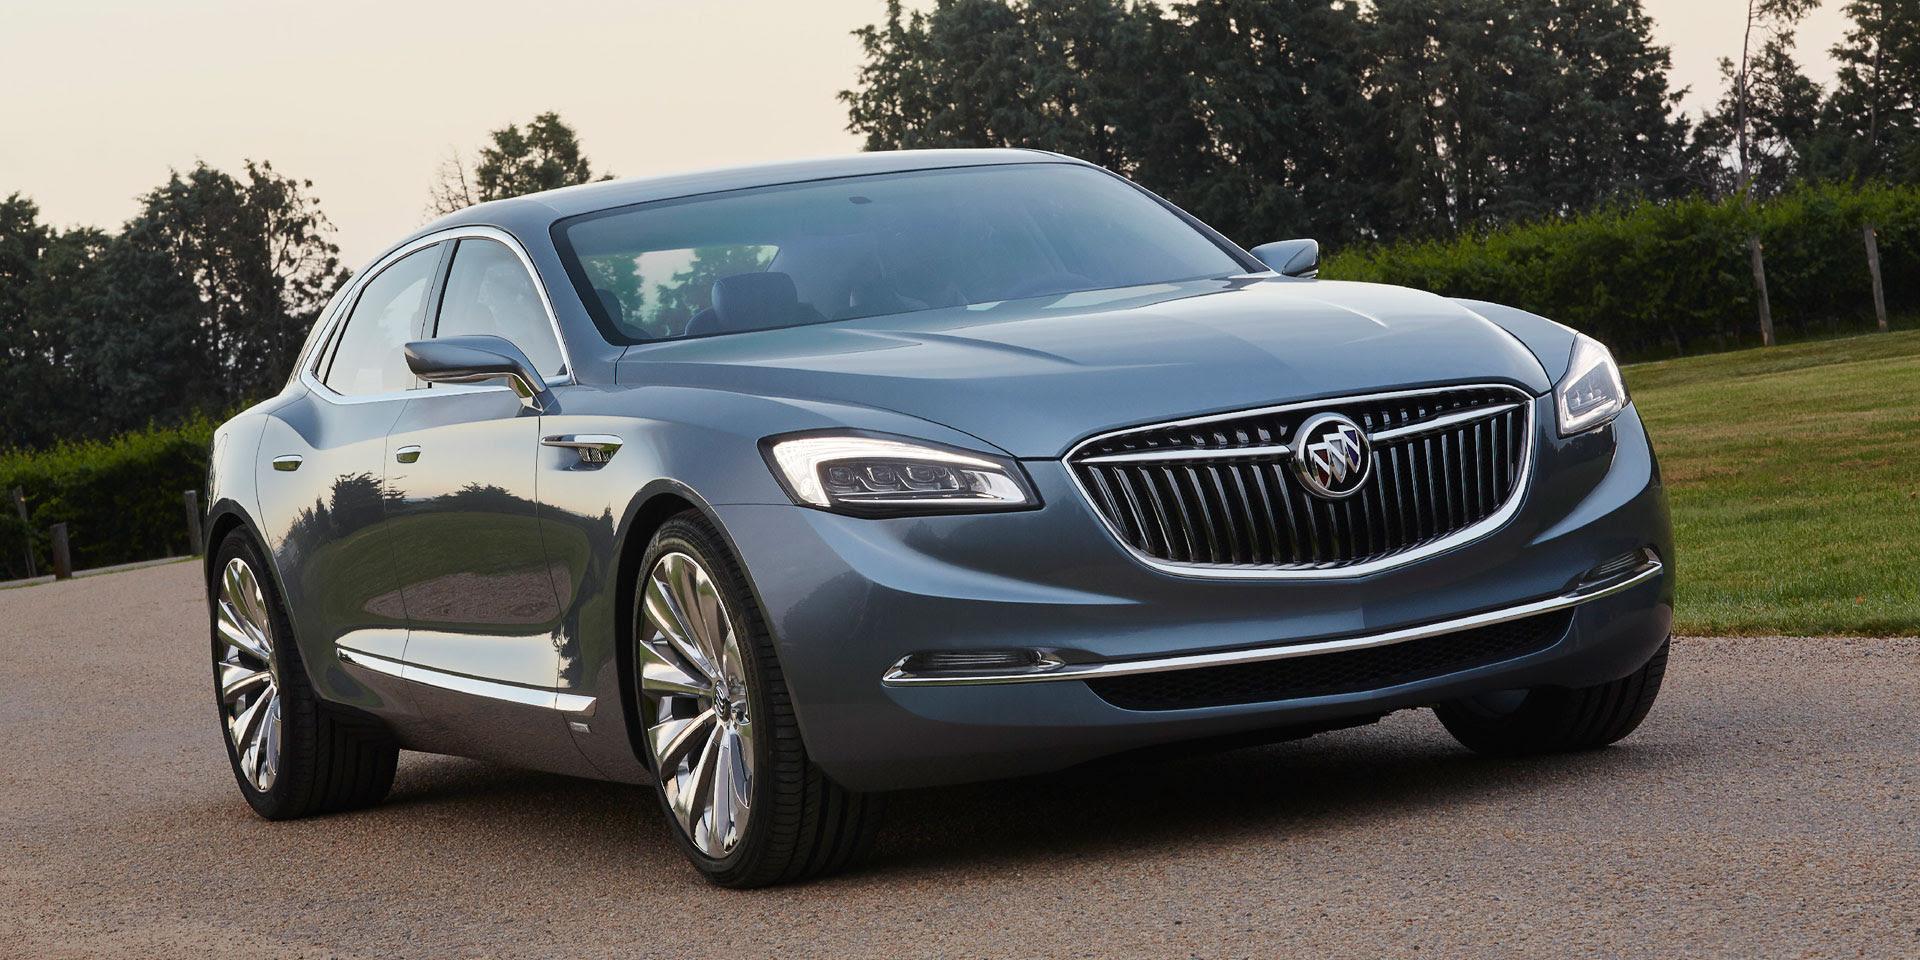 2015 - Buick - Avenir - Vehicles on Display | Chicago Auto ...